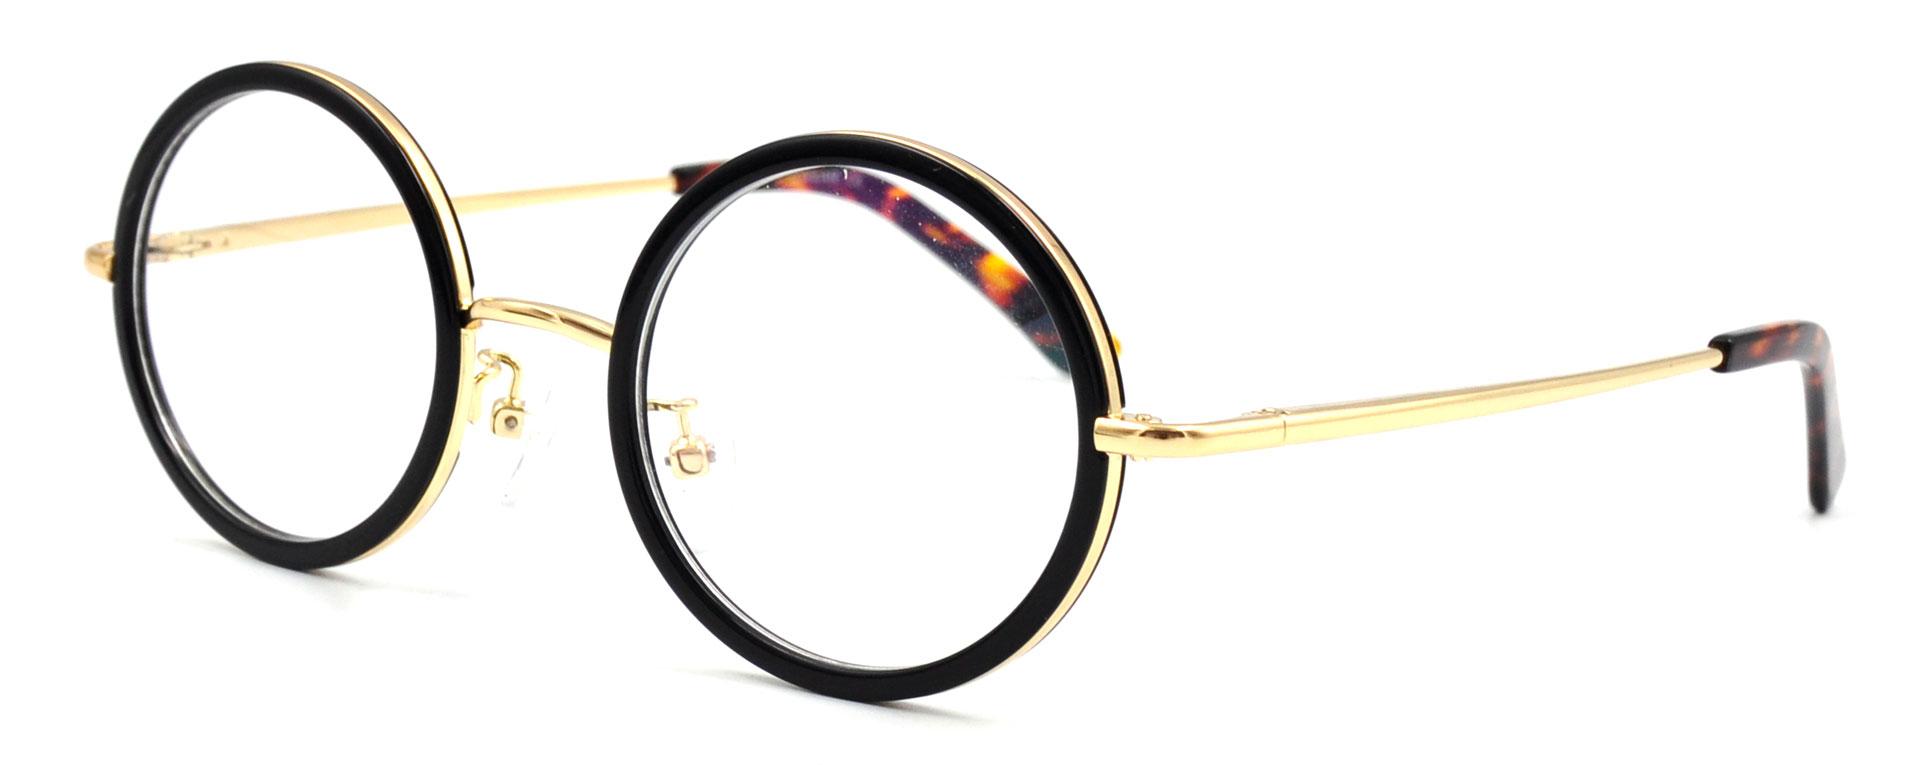 Vintage Retro Mens Womens Oval Round Metal Eyeglass Frames Glasses ...